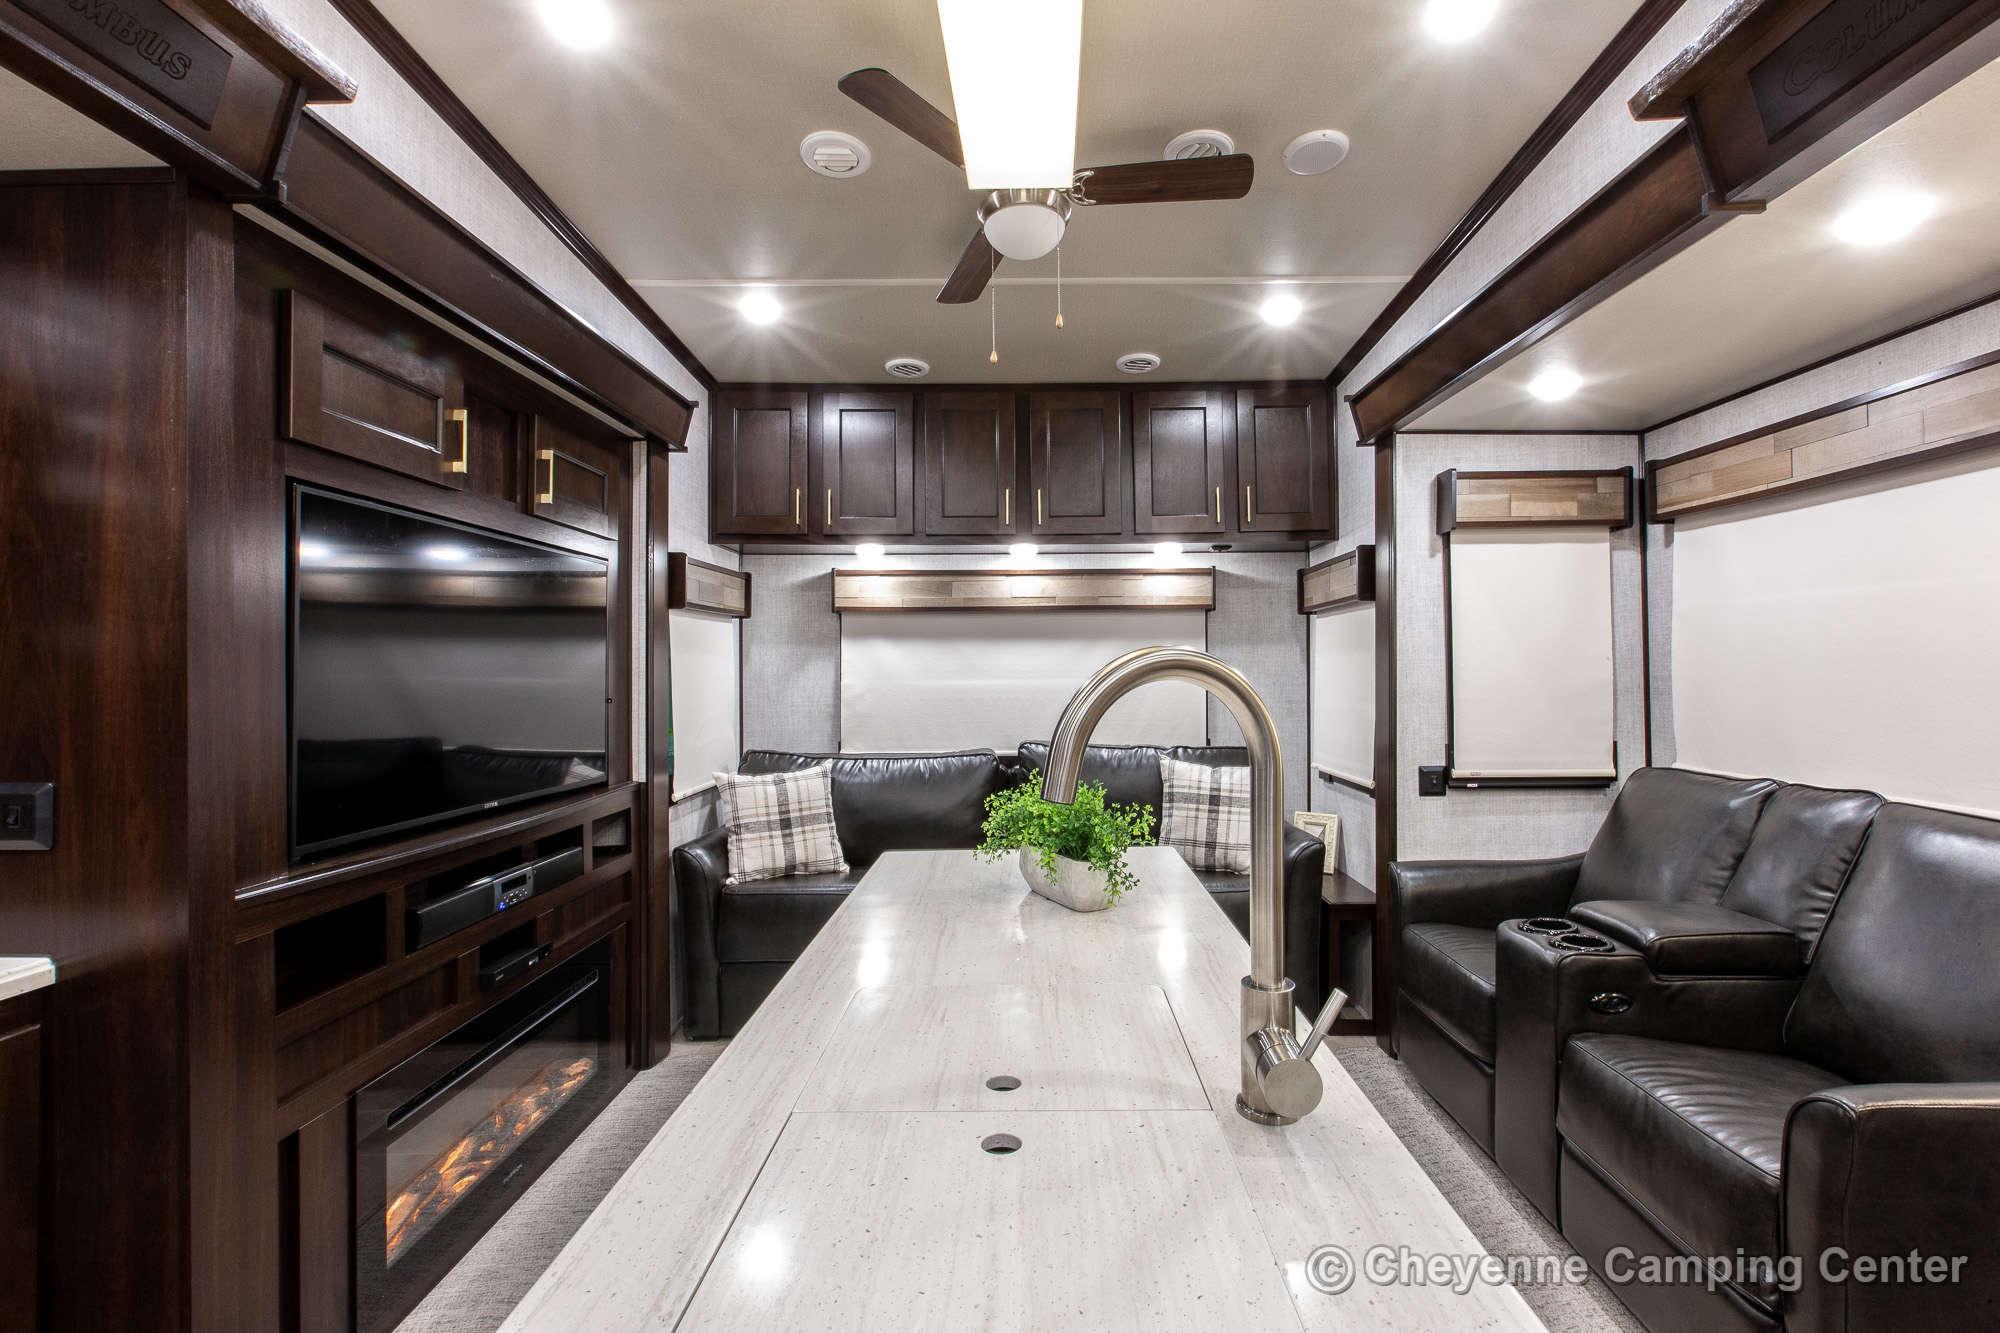 2020 Palomino Columbus 328RL Fifth Wheel Interior Image